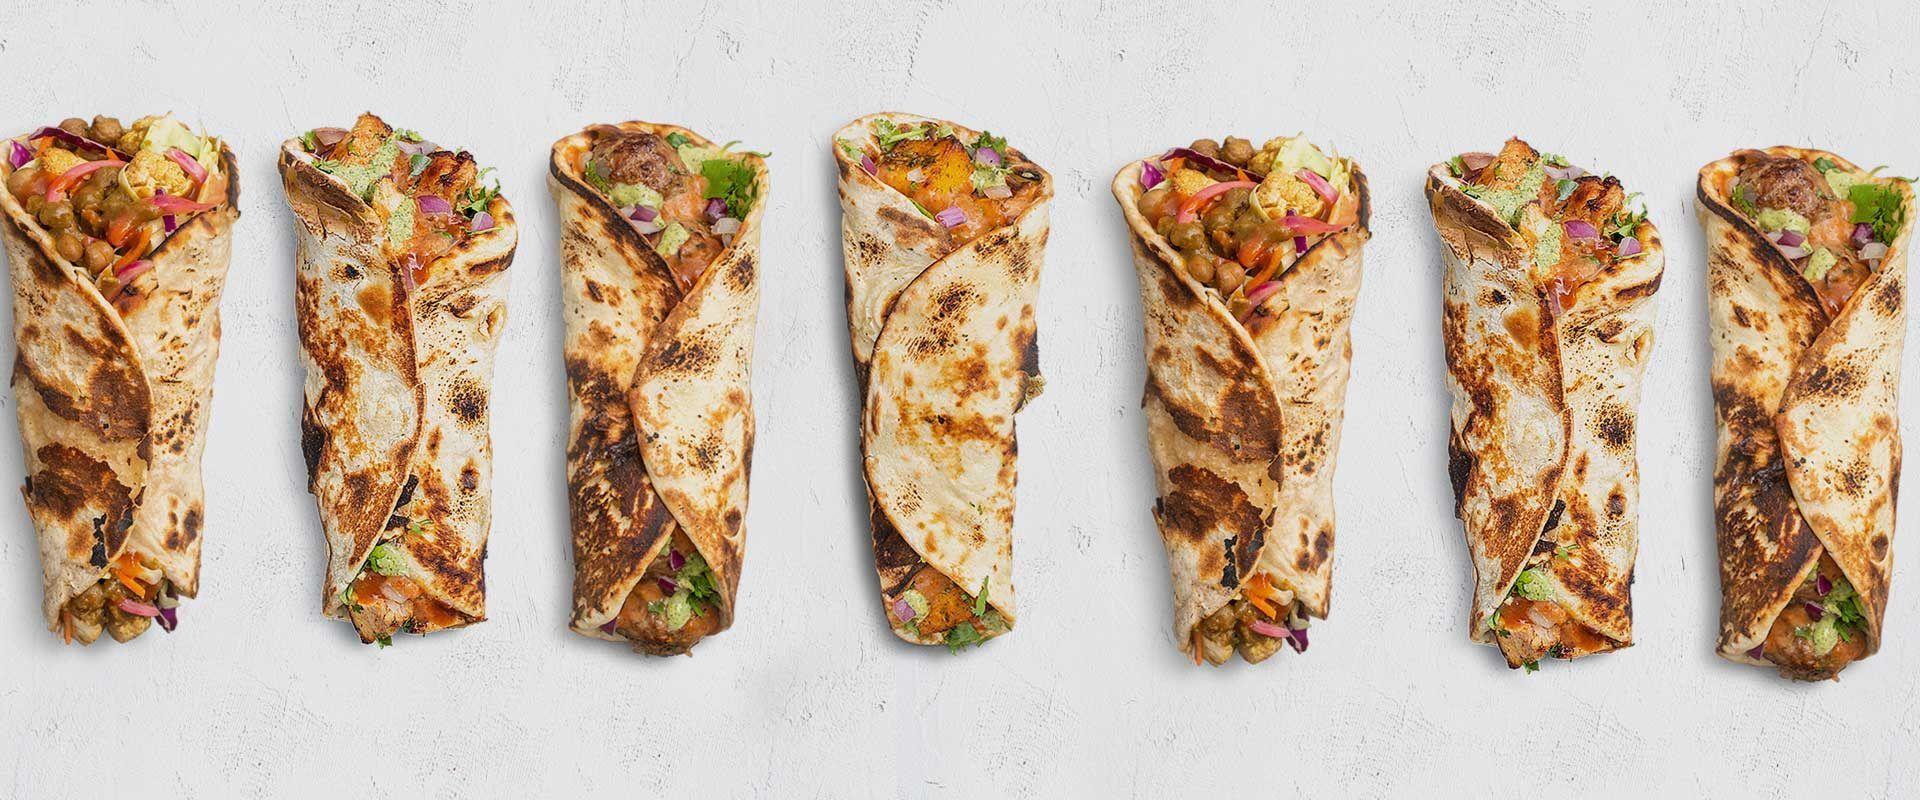 chicken wrap, paneer wrap, lamb wrap and vegan chickpea wrap